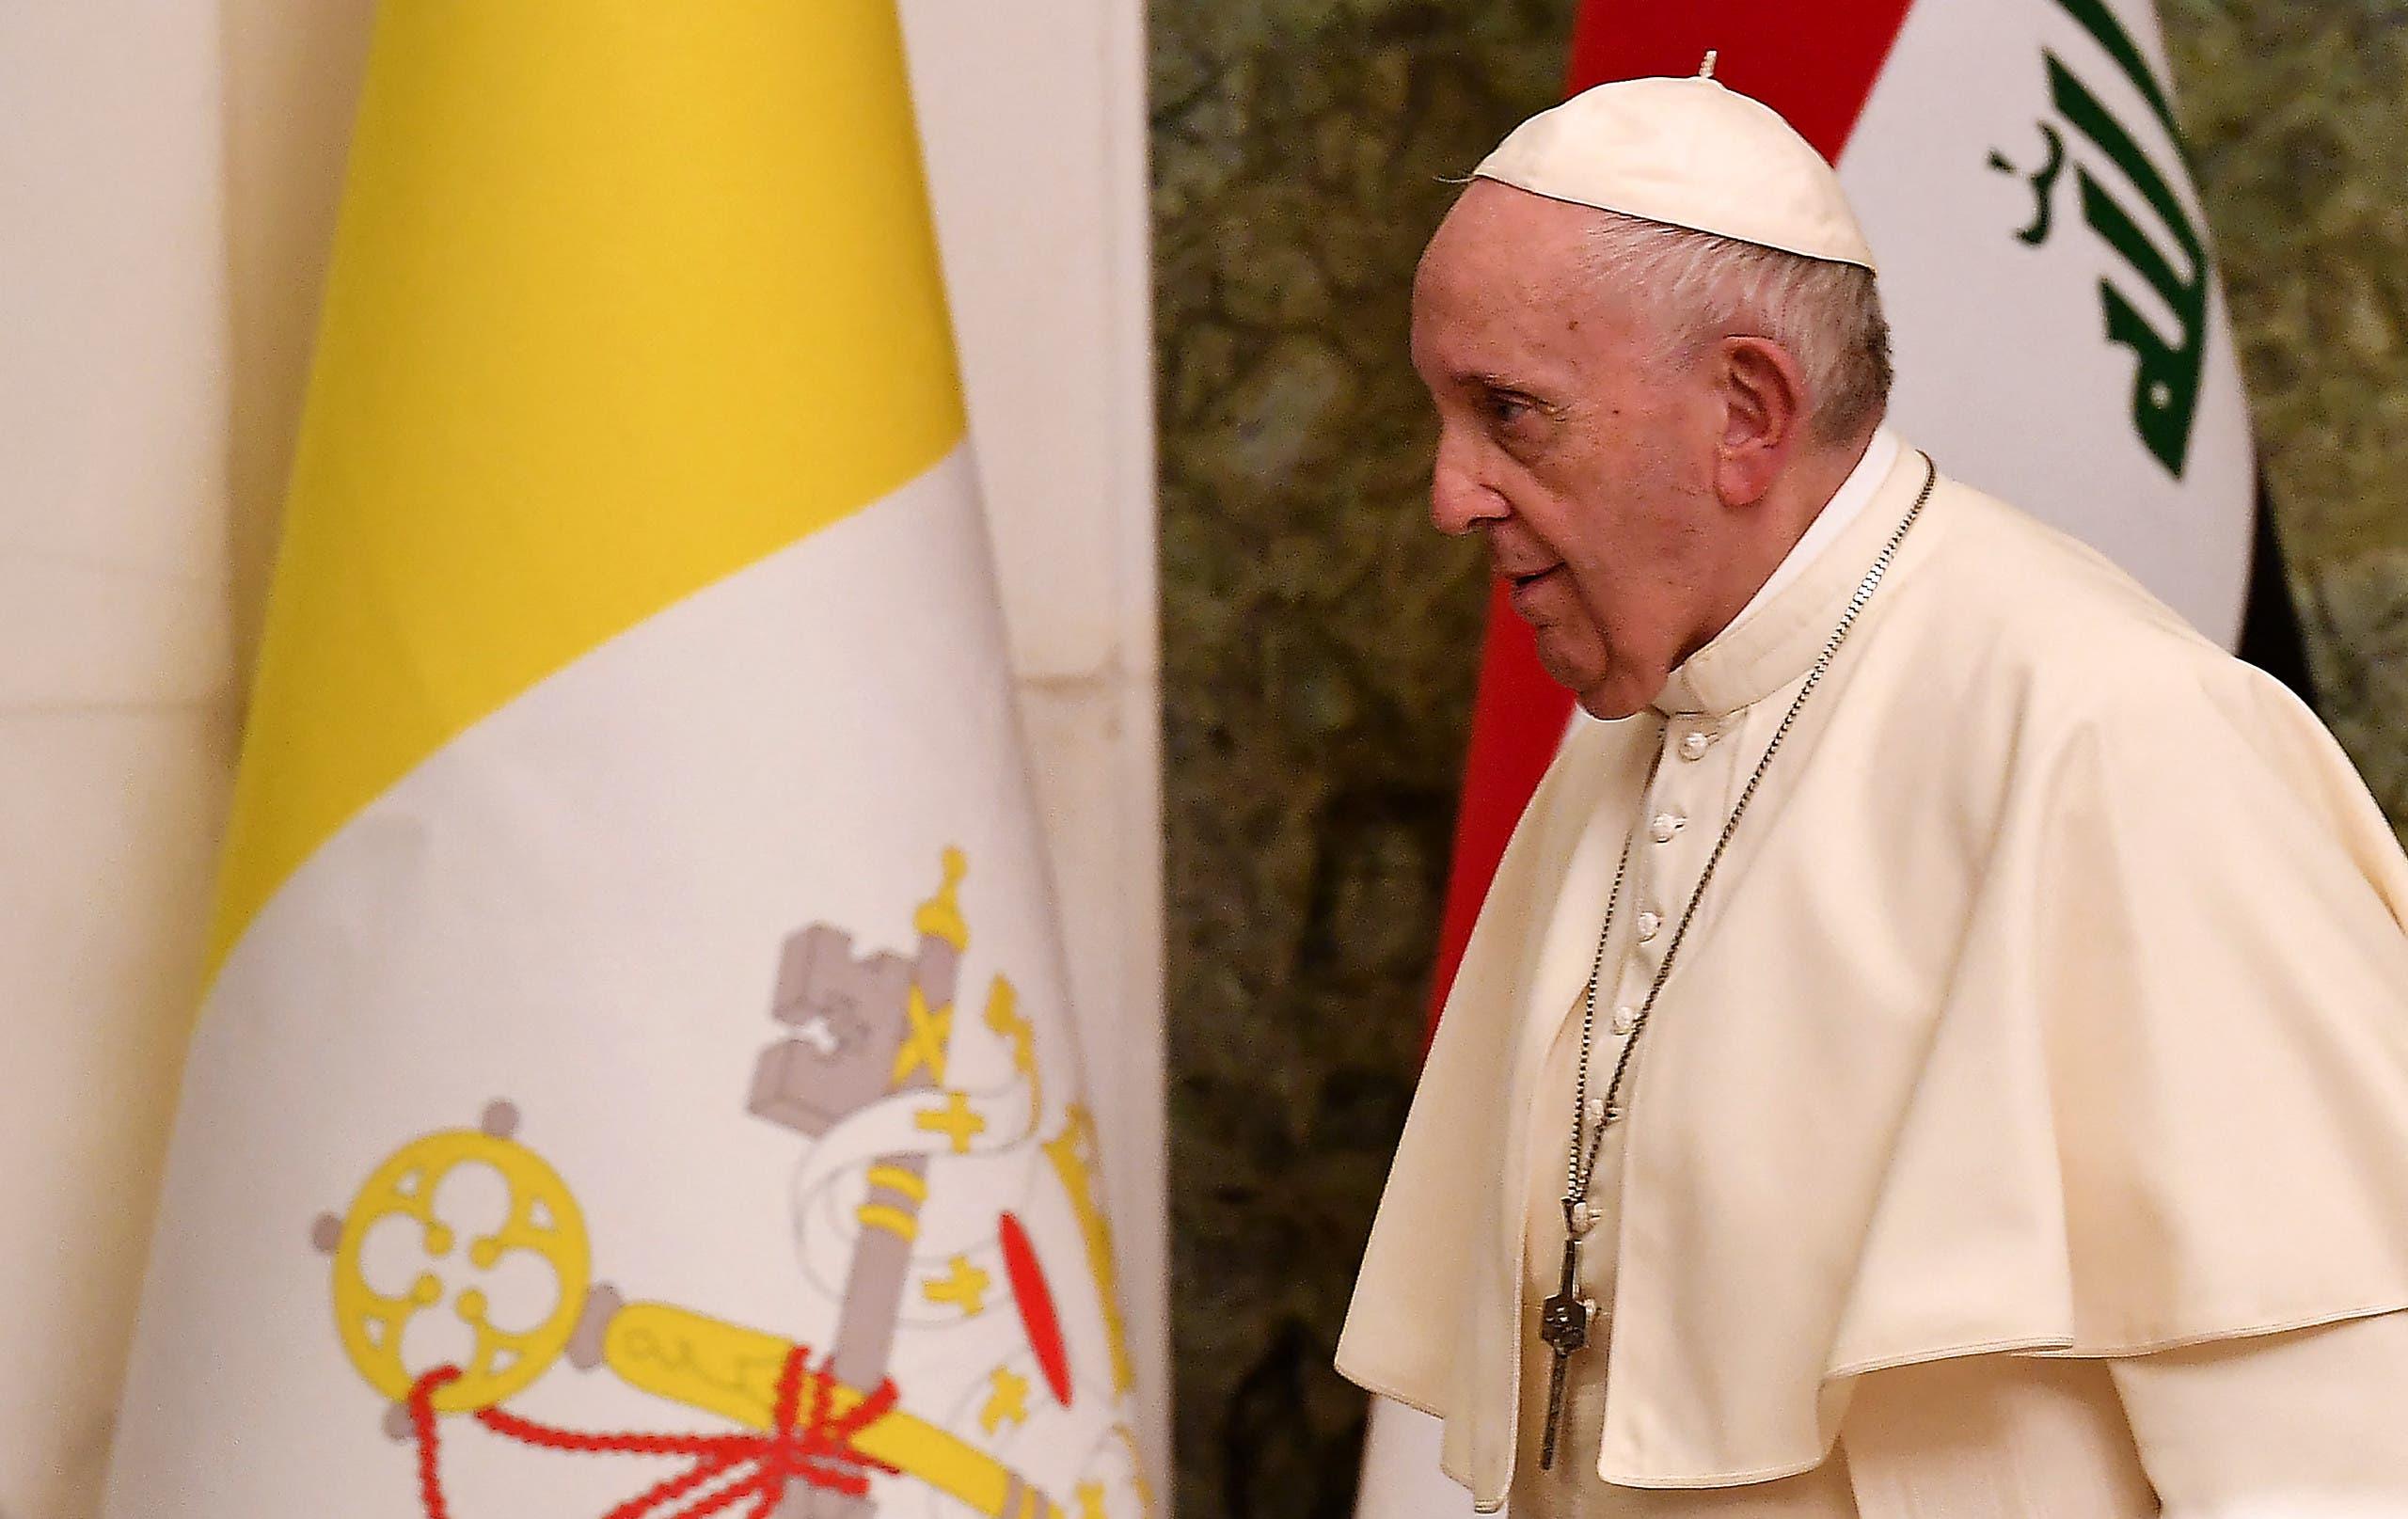 البابا فرنسيس في بغداد (فرانس برس)